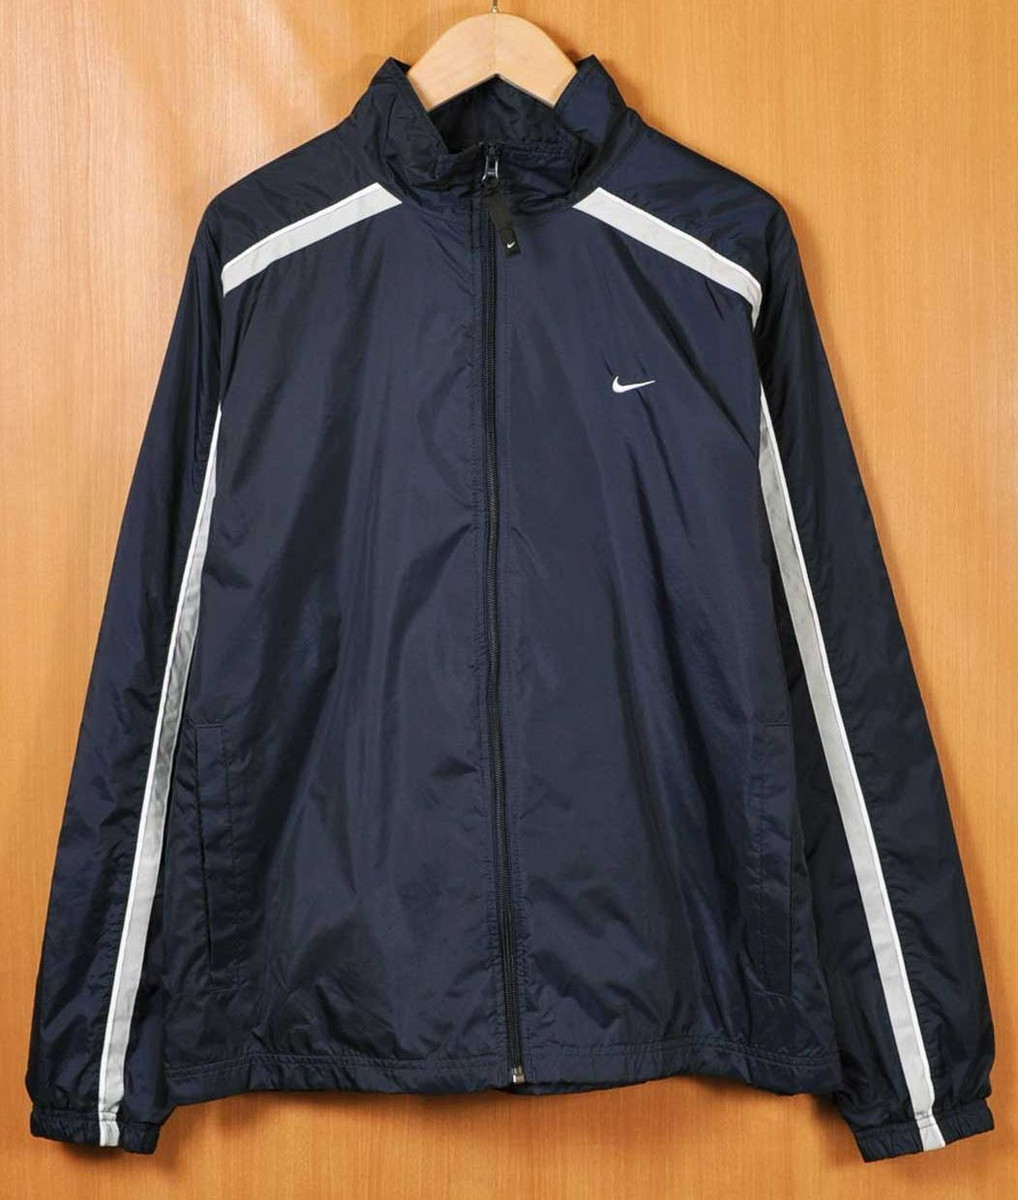 USED CLOTHING PENGUINTRIPPER  NIKE Nike nylon jacket navy X light gray men  L equivalency□  6174f74ce